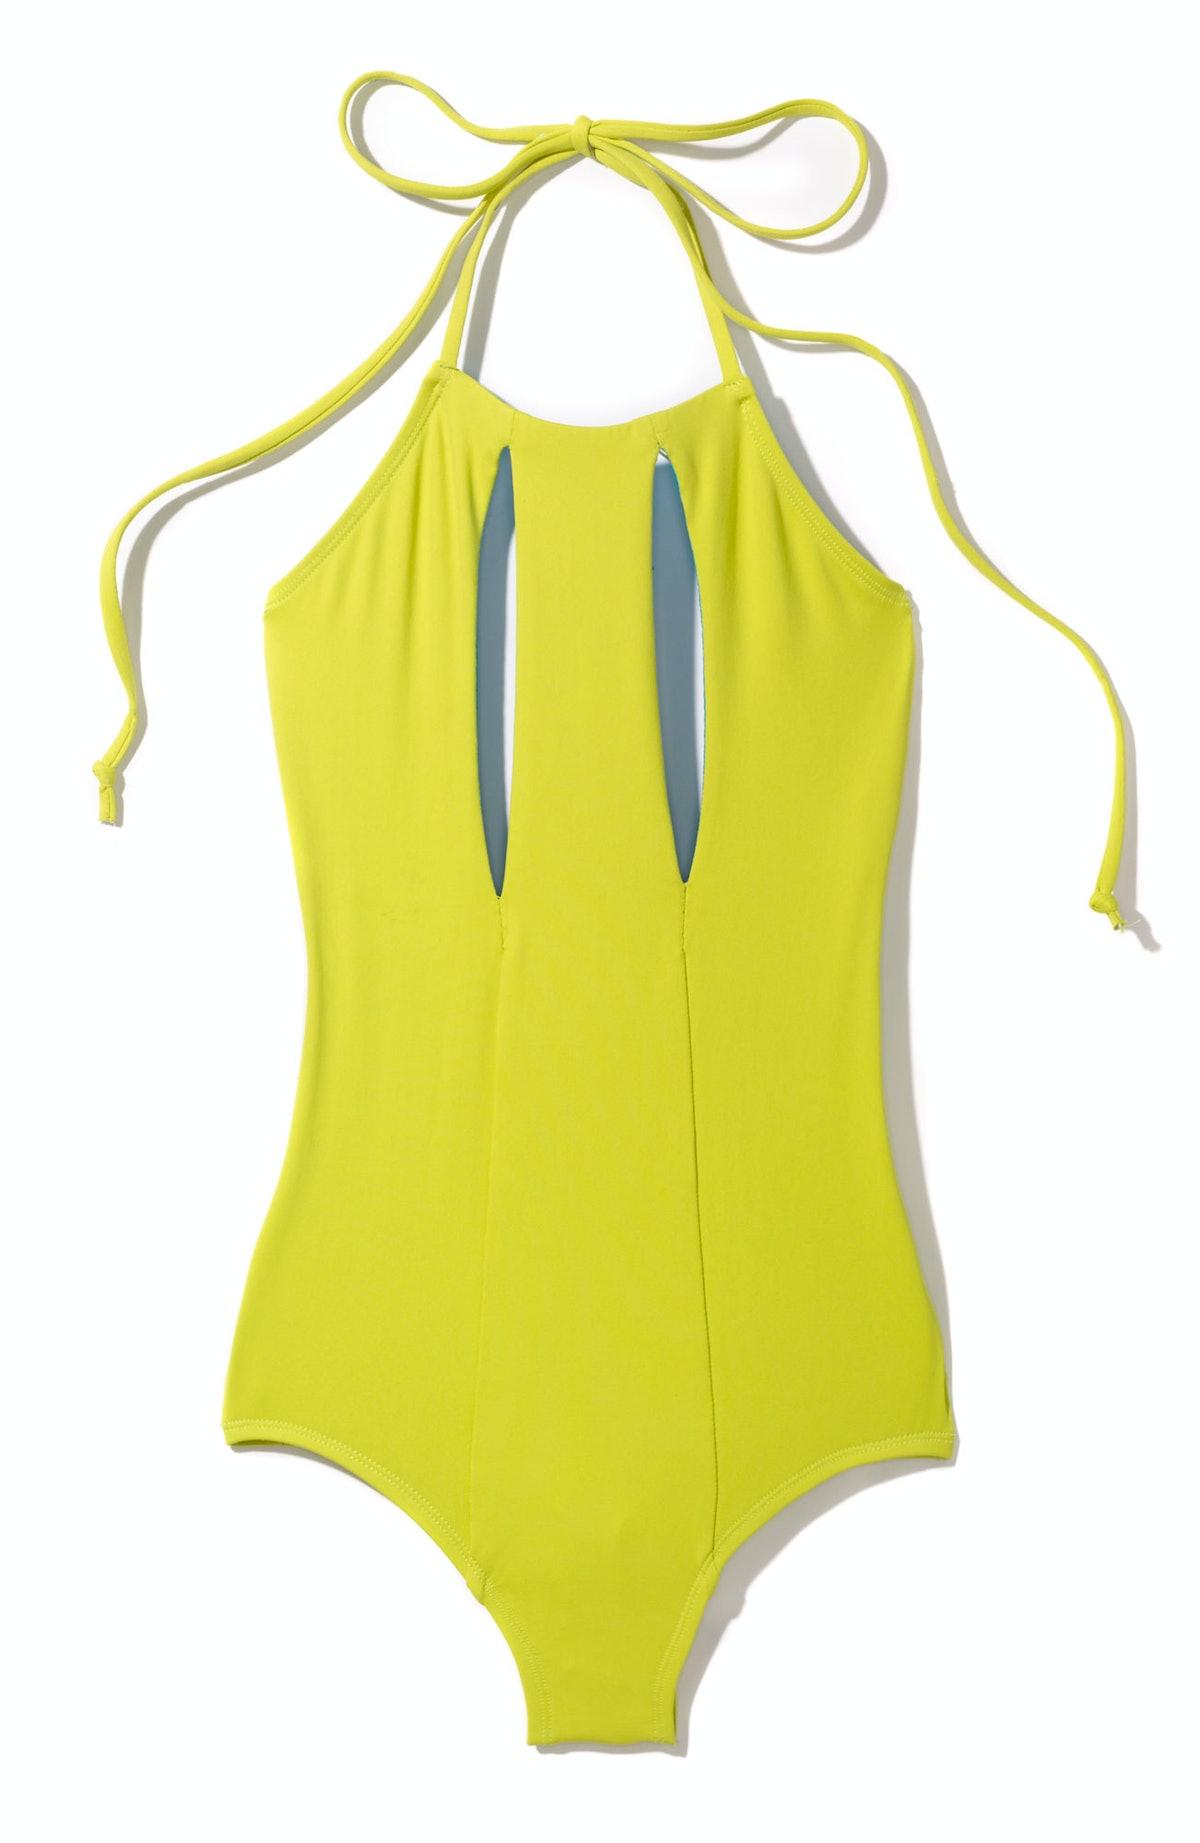 Cushnie et Ochs swimsuit, $375, Intermix, 855.446.4943.